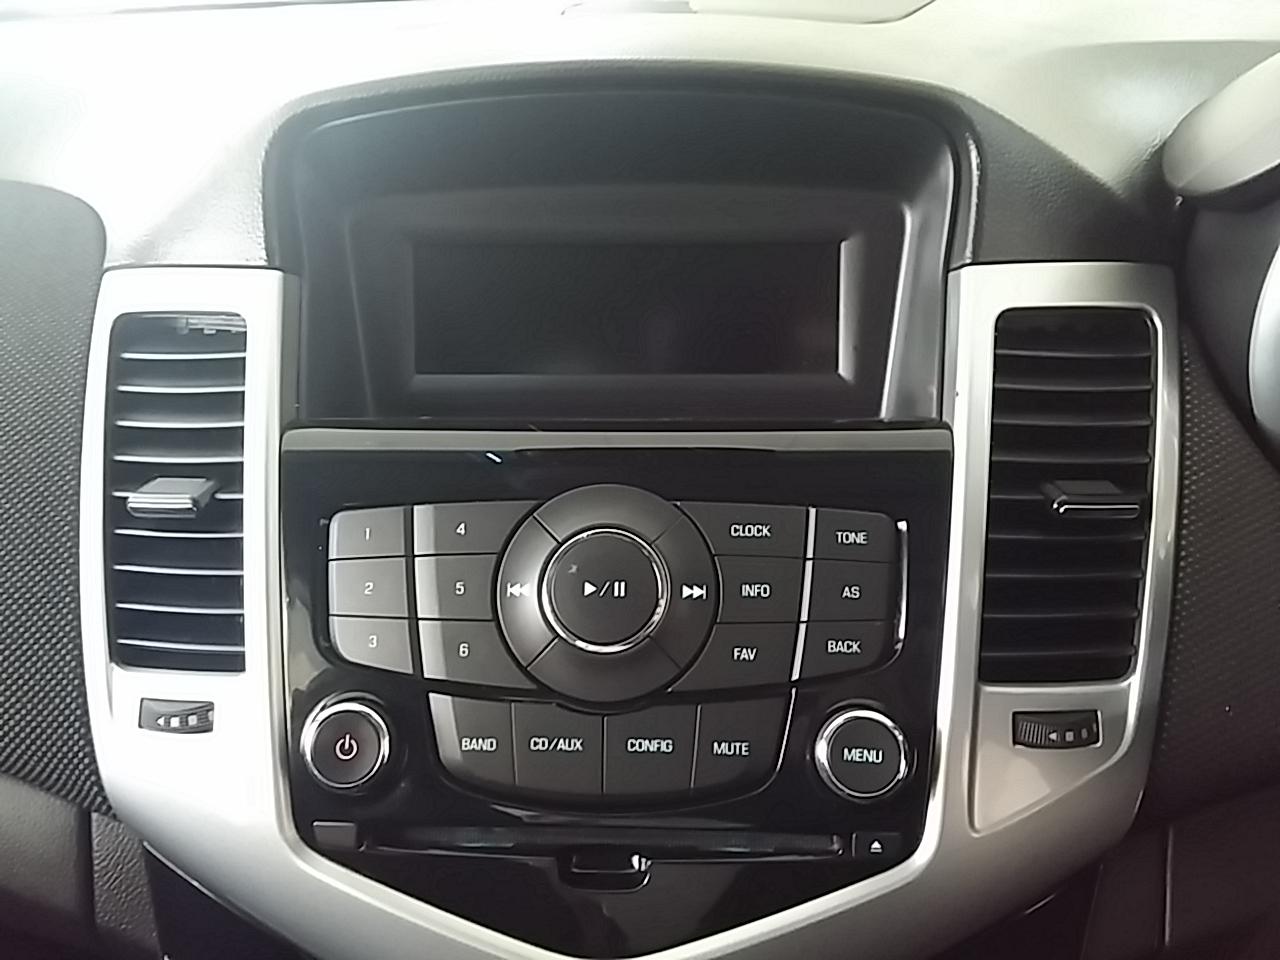 Chevrolet Cruze 1.6 Ls 5dr